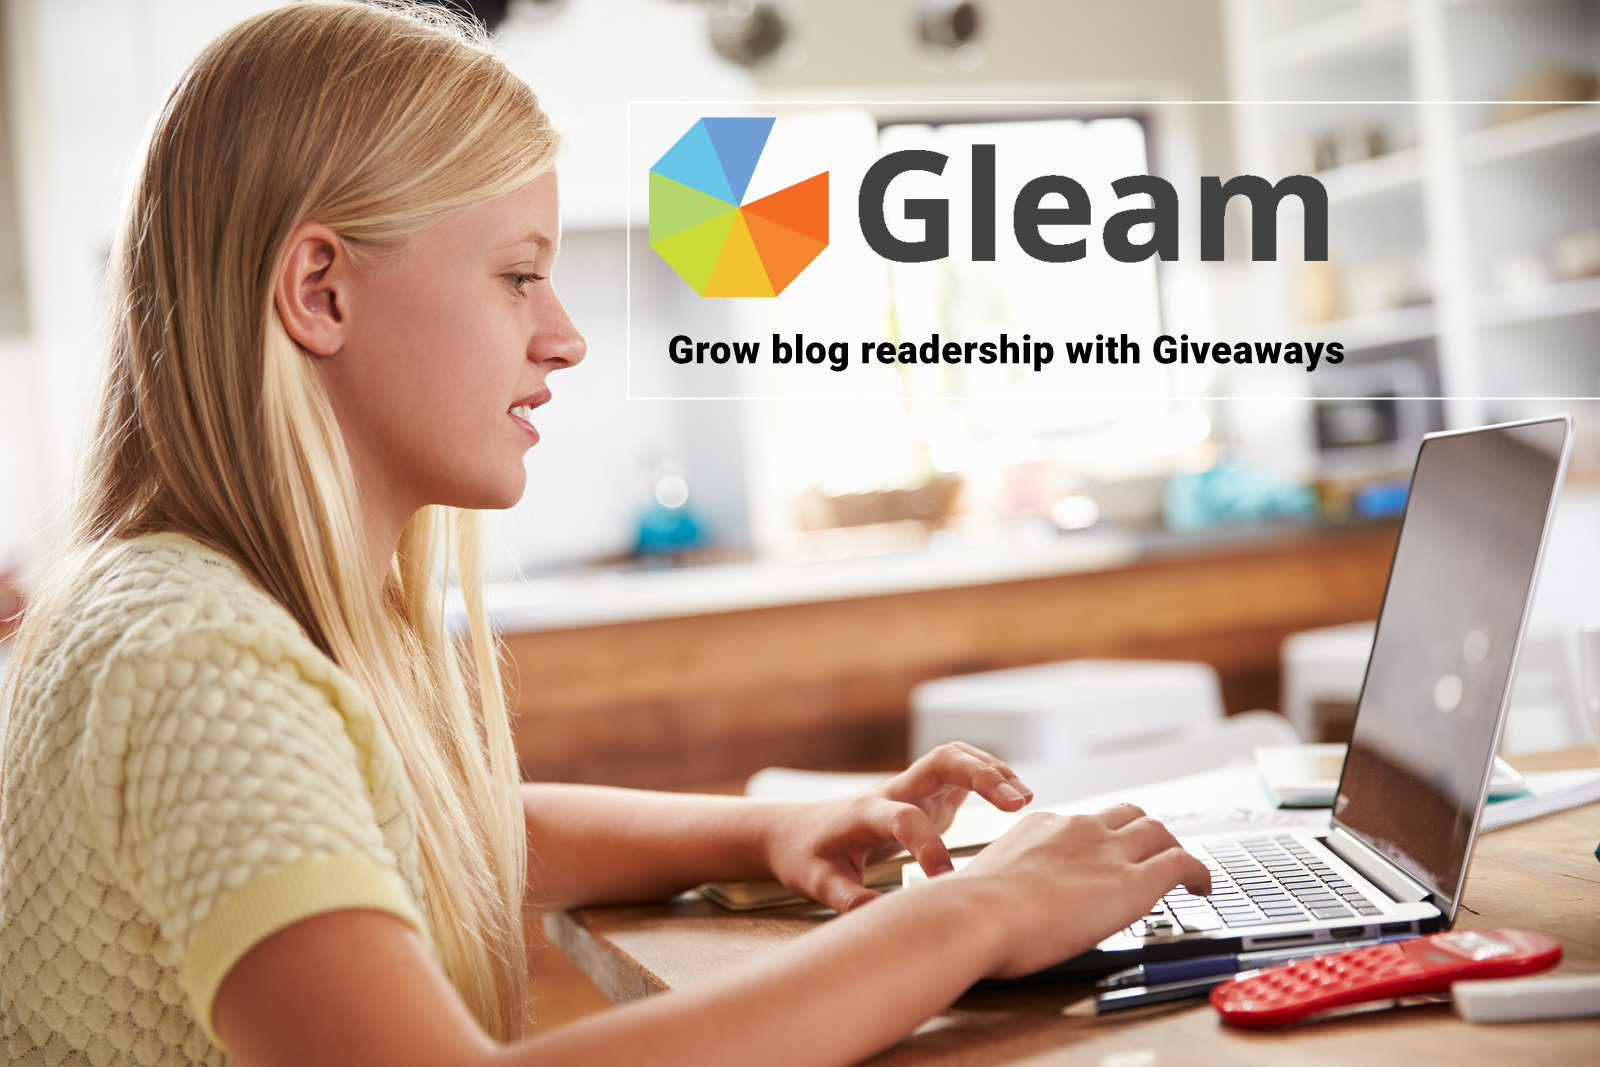 Gleam to grow blog readership through giveaways